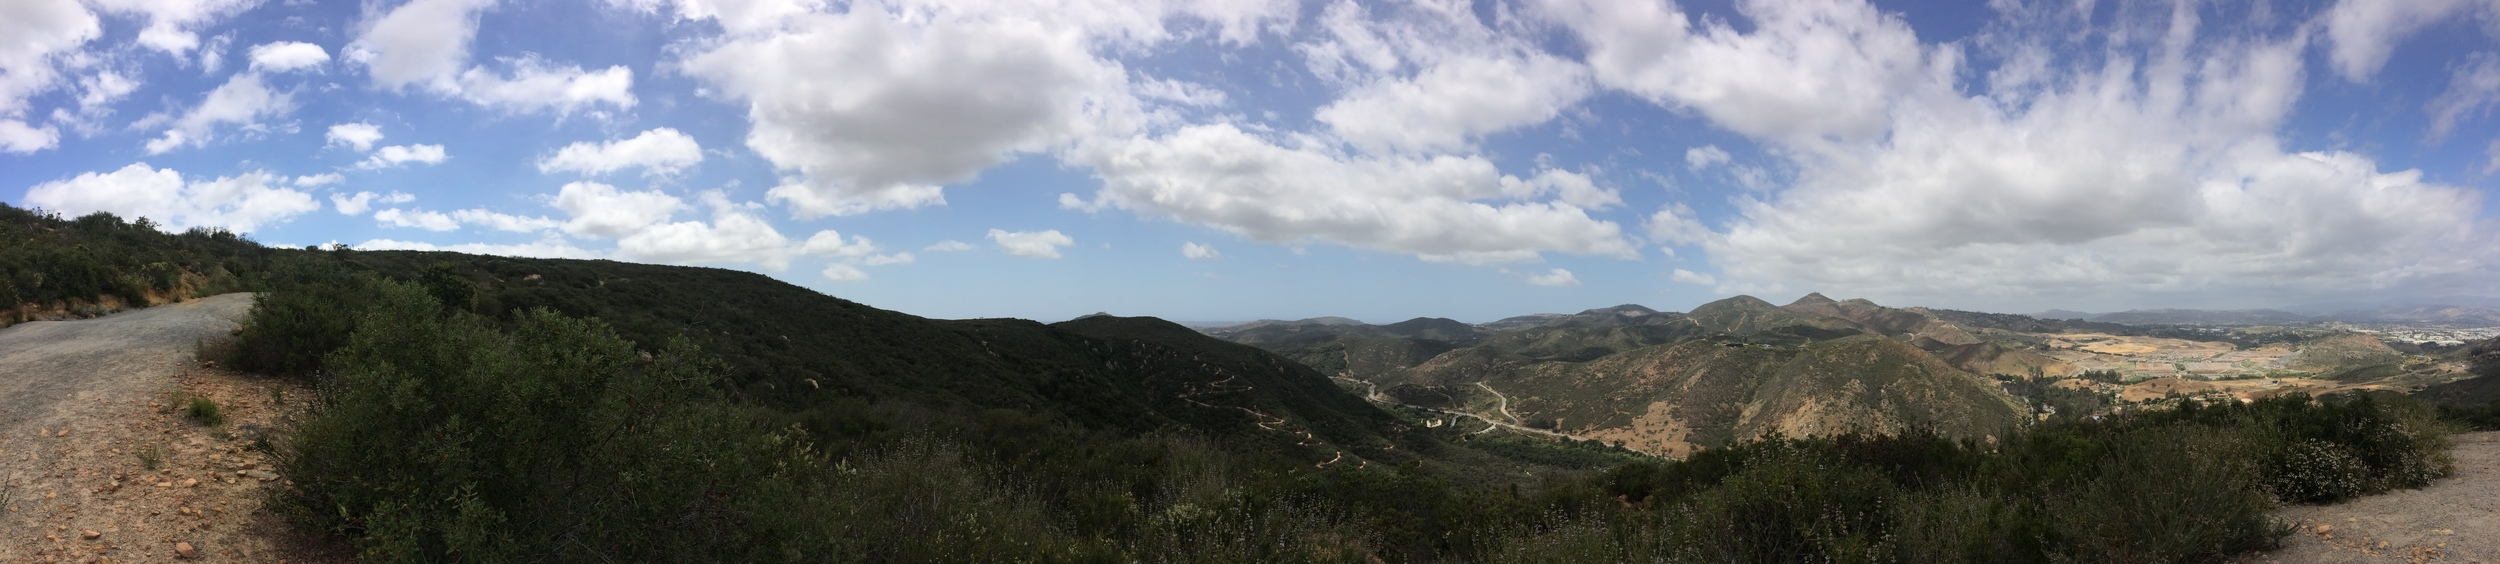 Looking toward Northeast San Diego County, Del Dios Highland Preserve